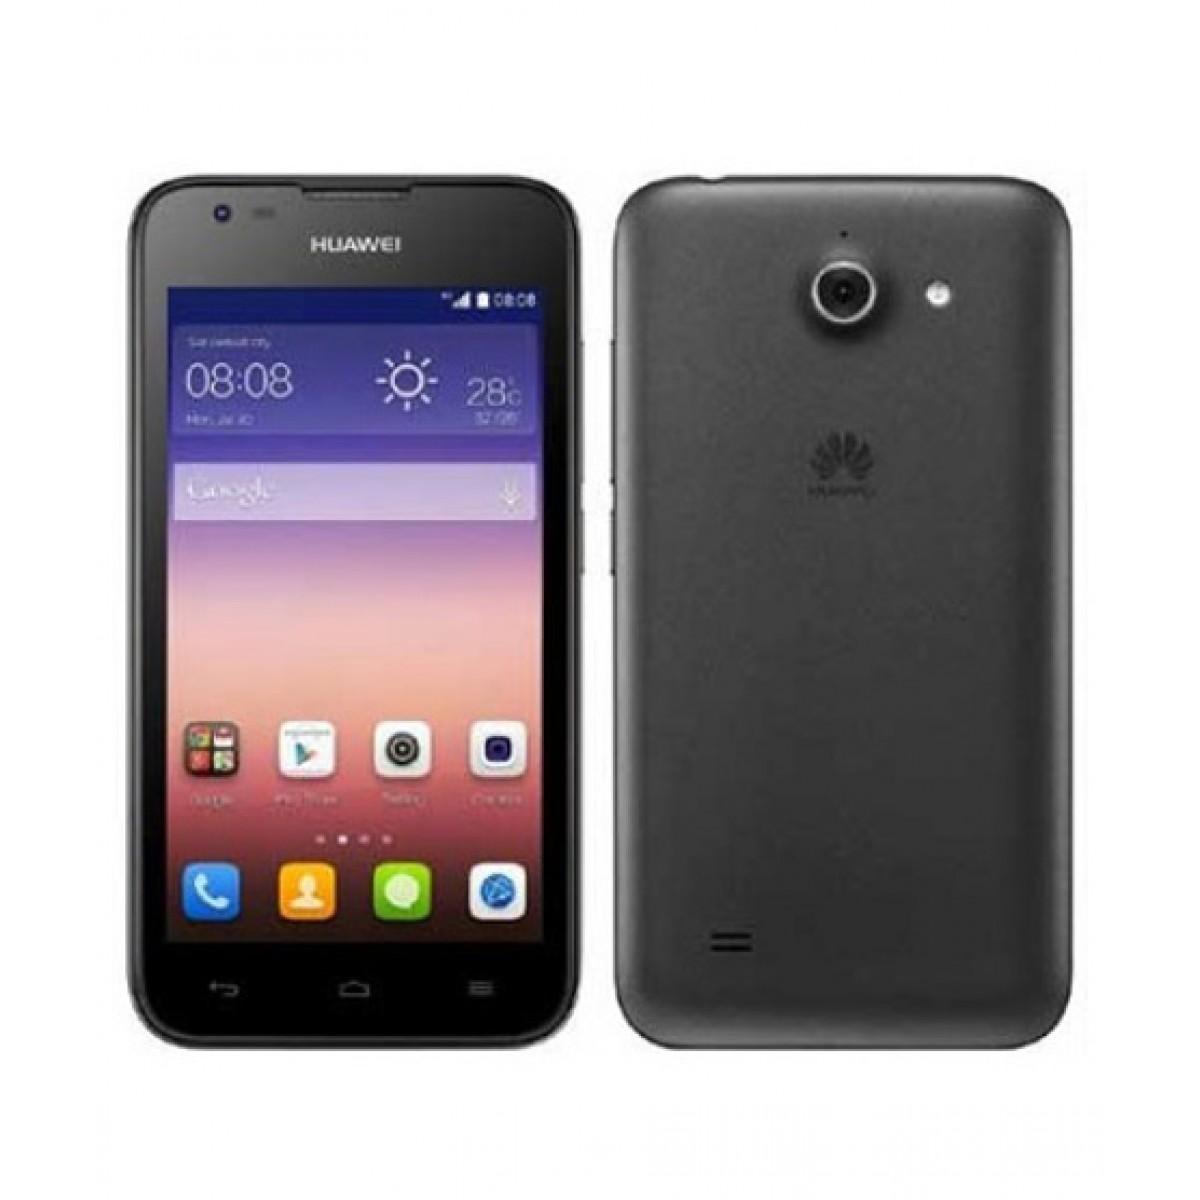 Huawei Ascend Y550 4G Dual Sim Black